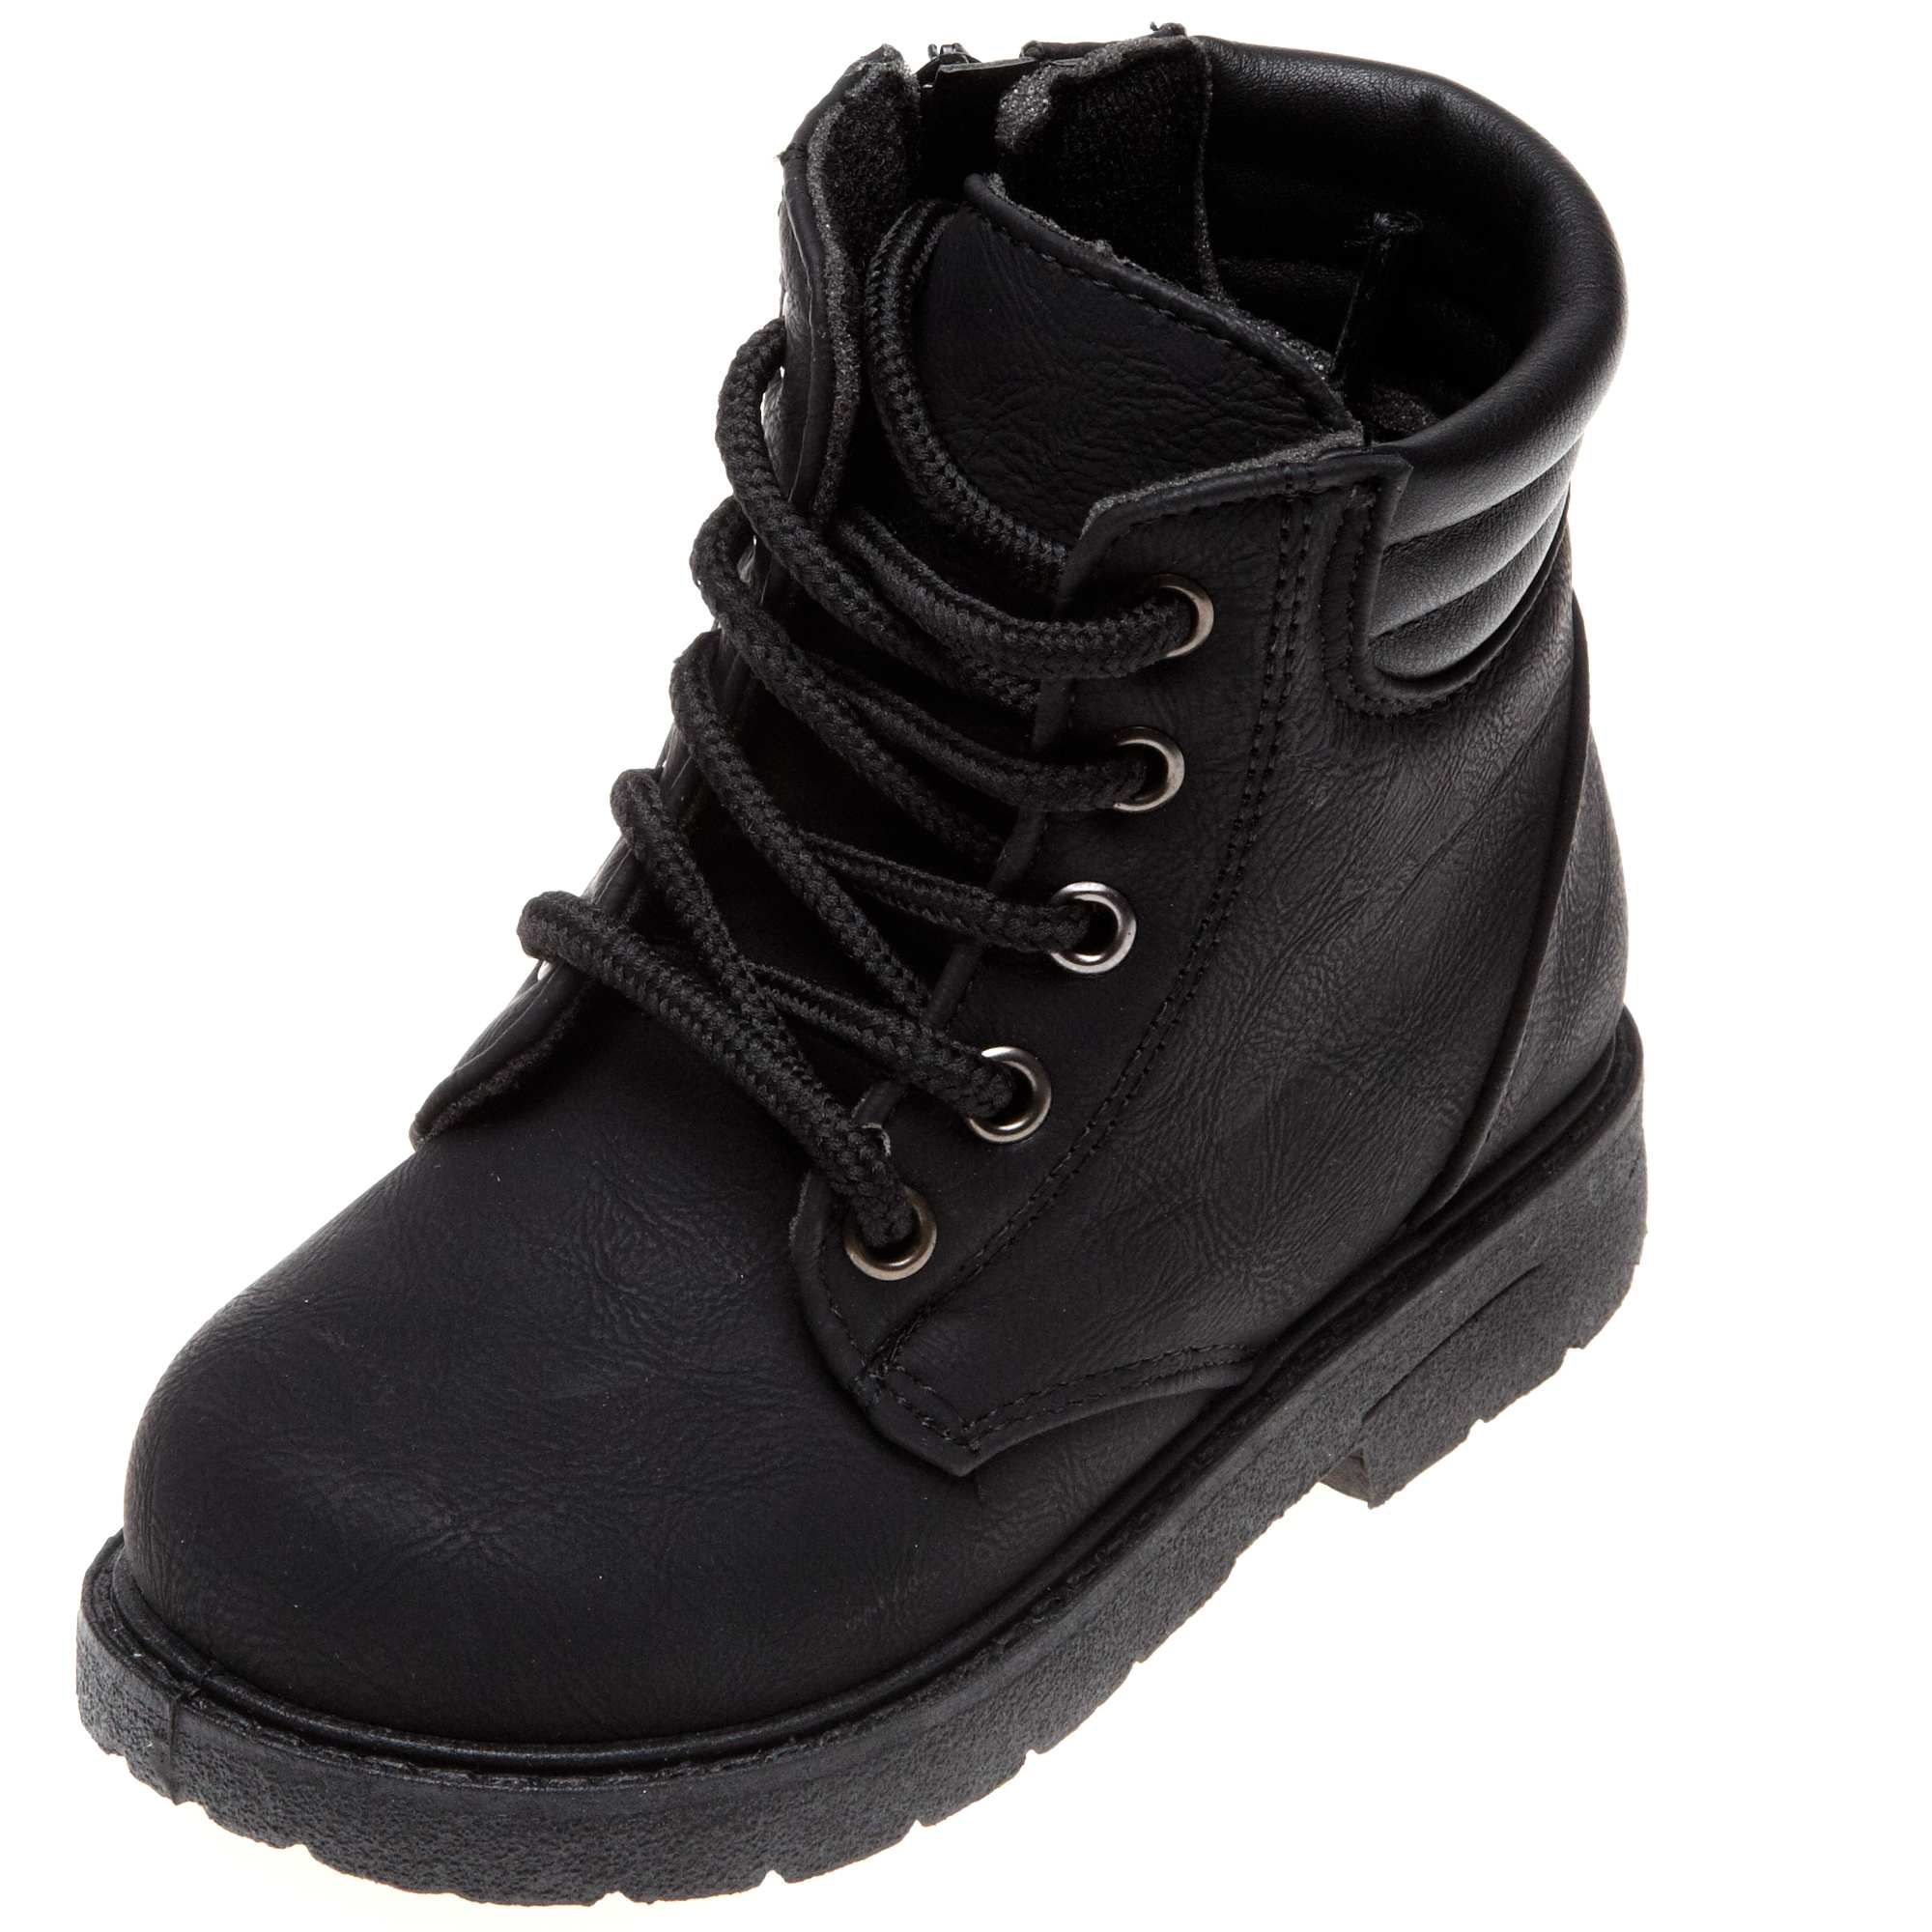 3c0421d3 Botines negros Infantil niño - Kiabi - | i like | Zapatos、Ropa ...